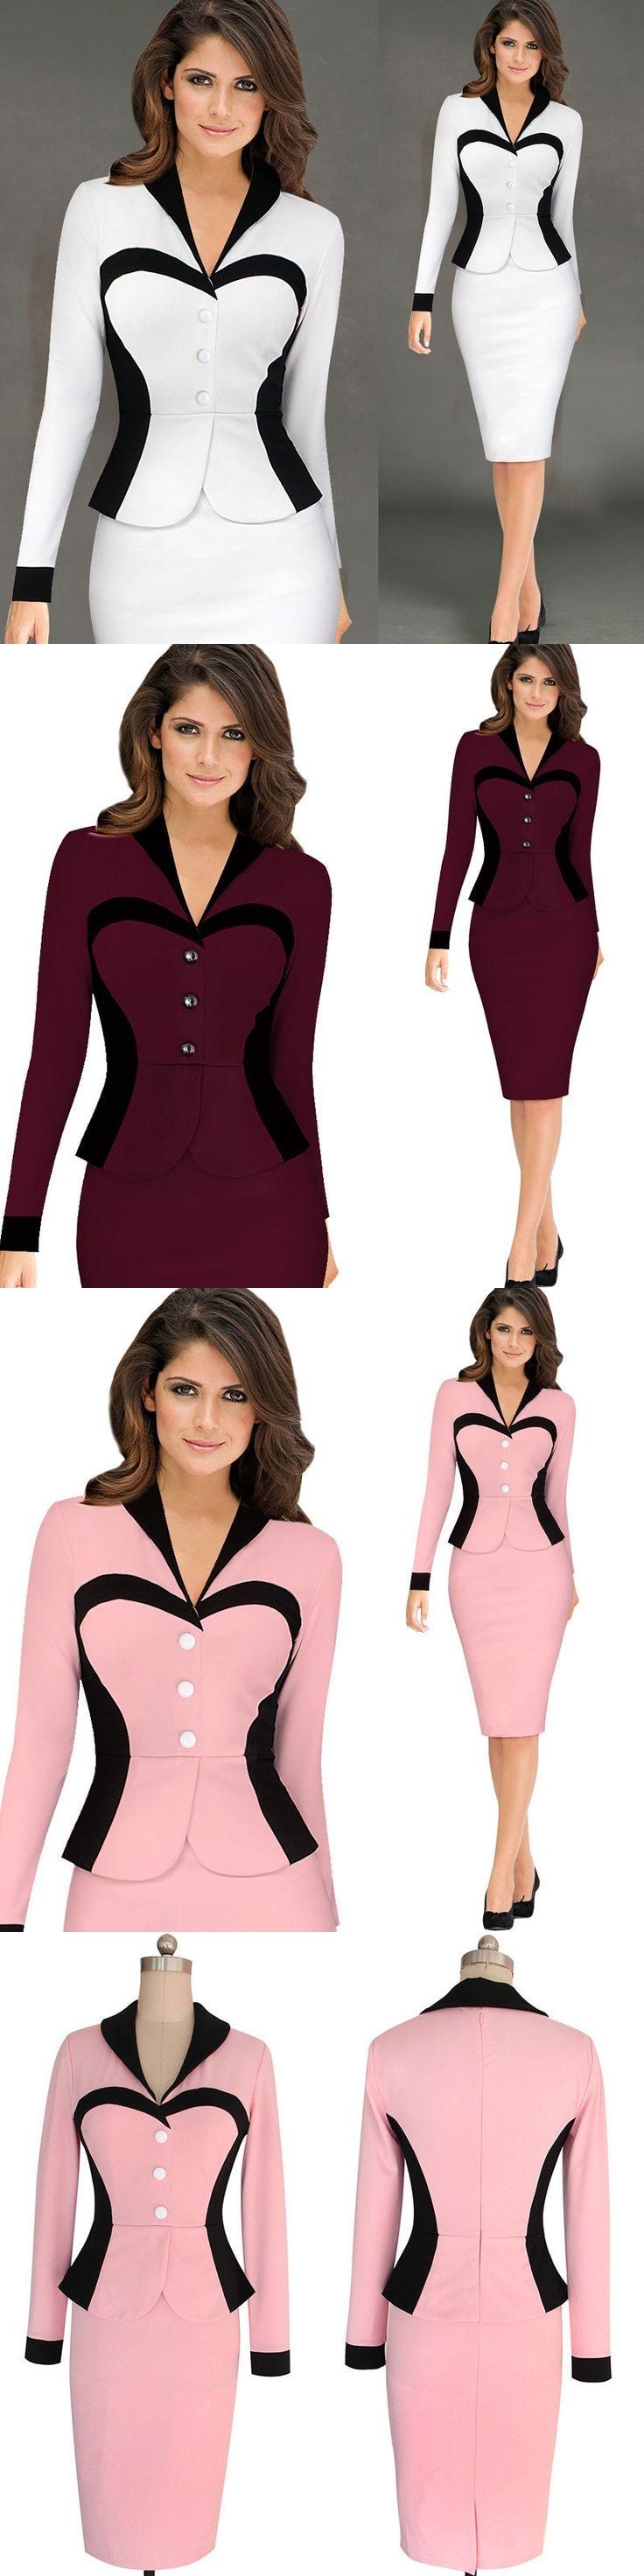 Womens Elegant Ruffles V-neck Peplum Vintage One Piece Dress Suit Wear To Work Office Business Party Bodycon Pencil Sheath Dress